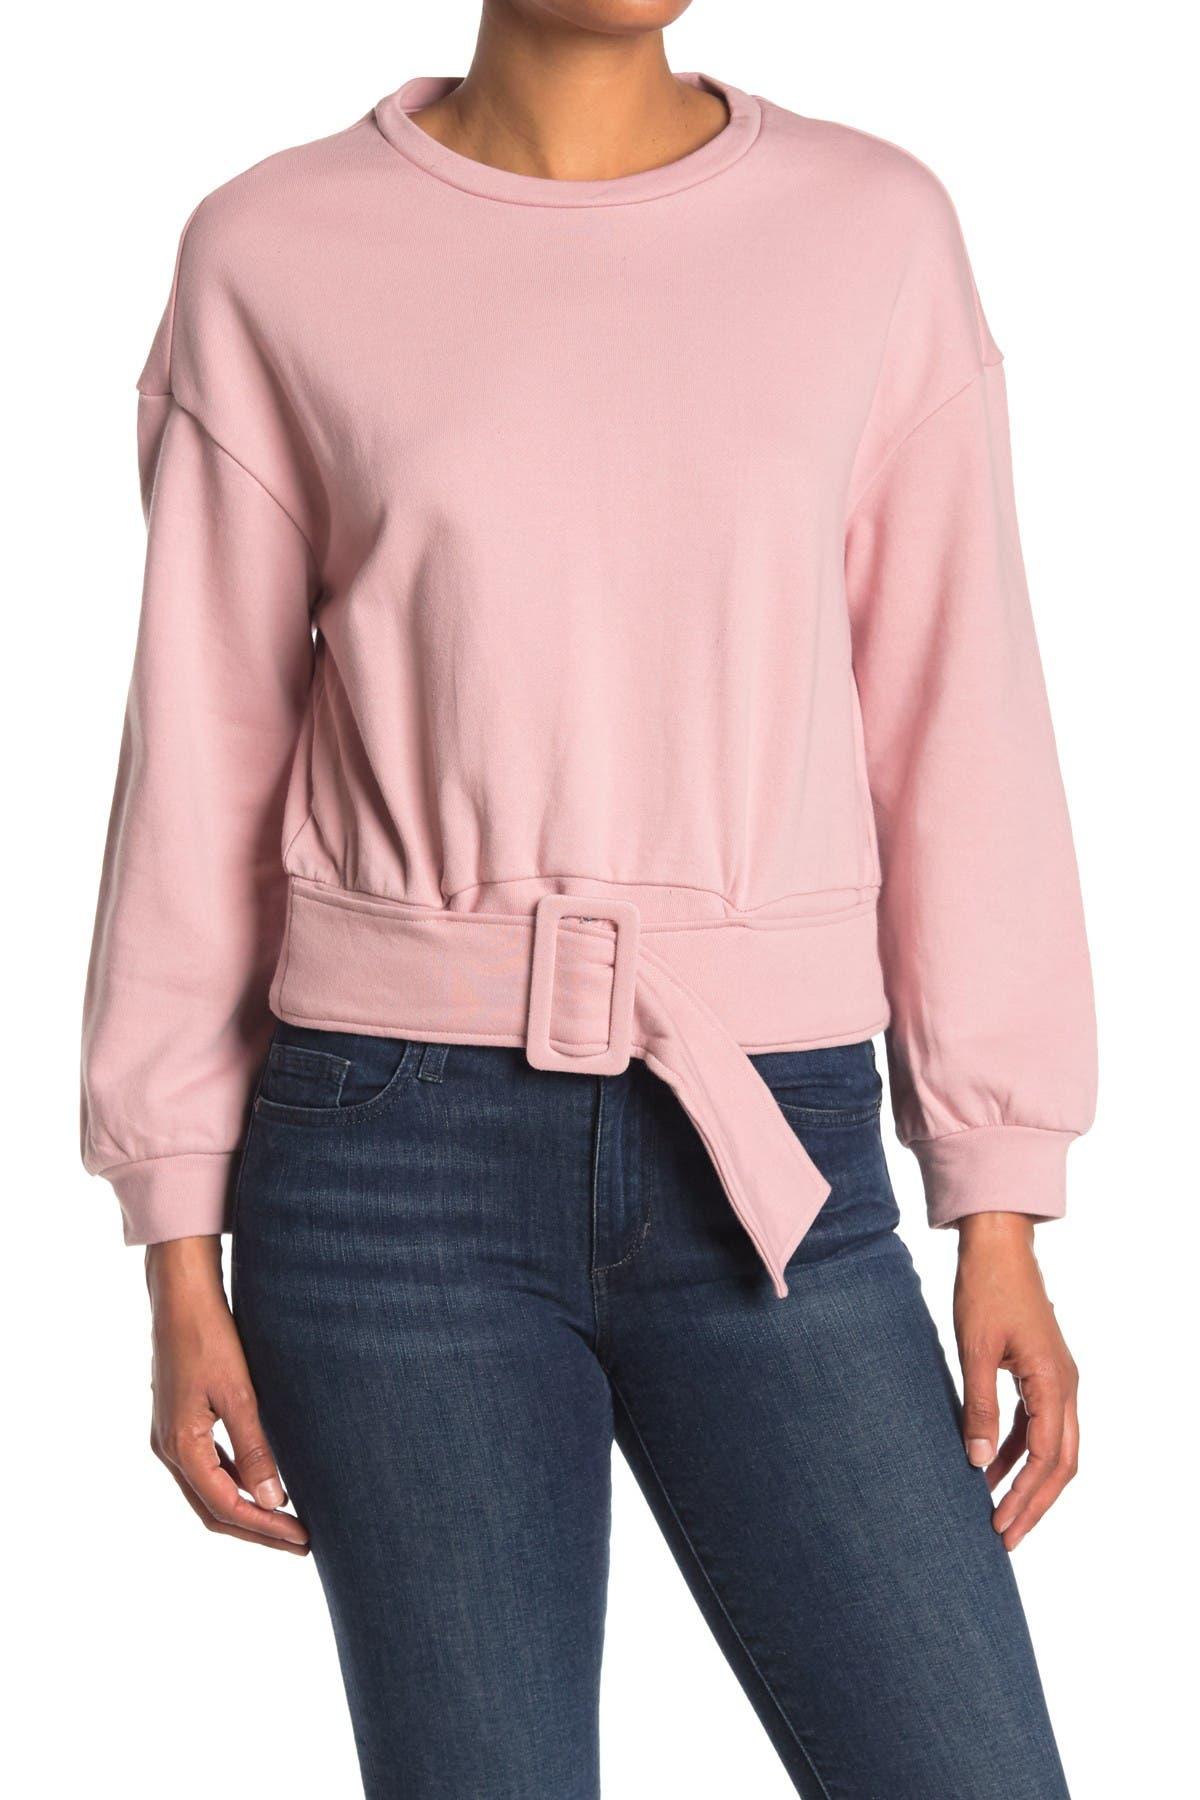 Image of Velvet Heart Savoya Belted Pullover Sweatshirt